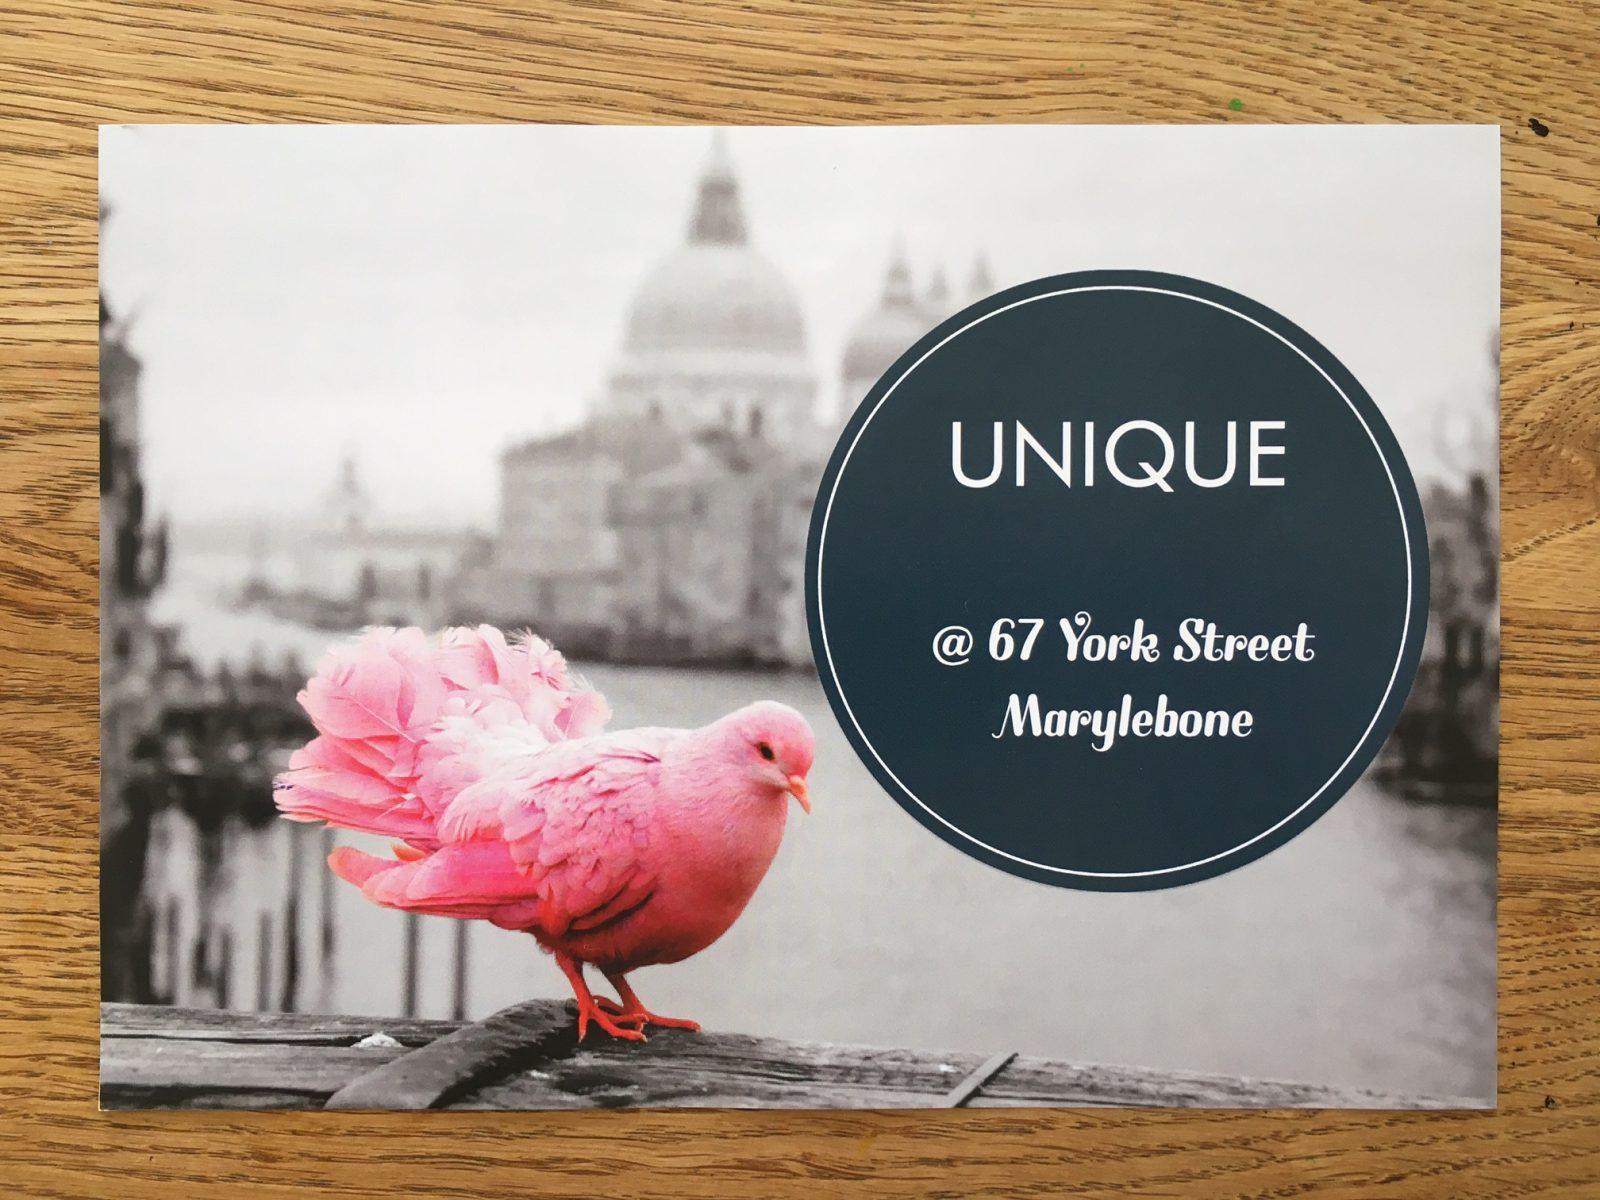 Unique popup Marylebone